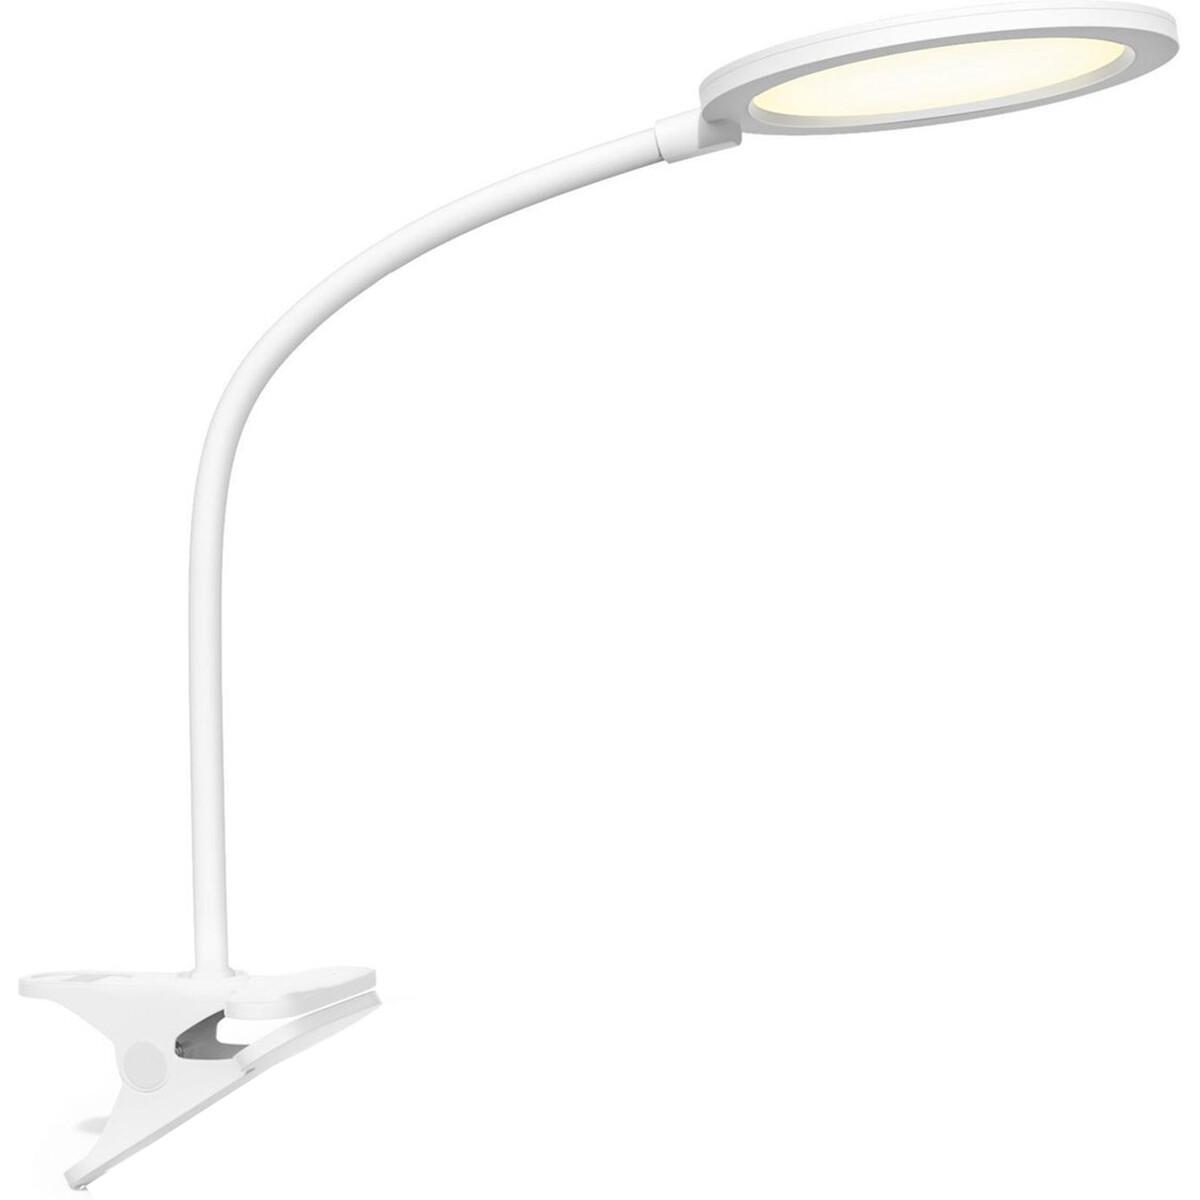 LED Klemlamp - Aigi Arona - 7W - Natuurlijk Wit 4000K - Rond - Mat Wit - Kunststof